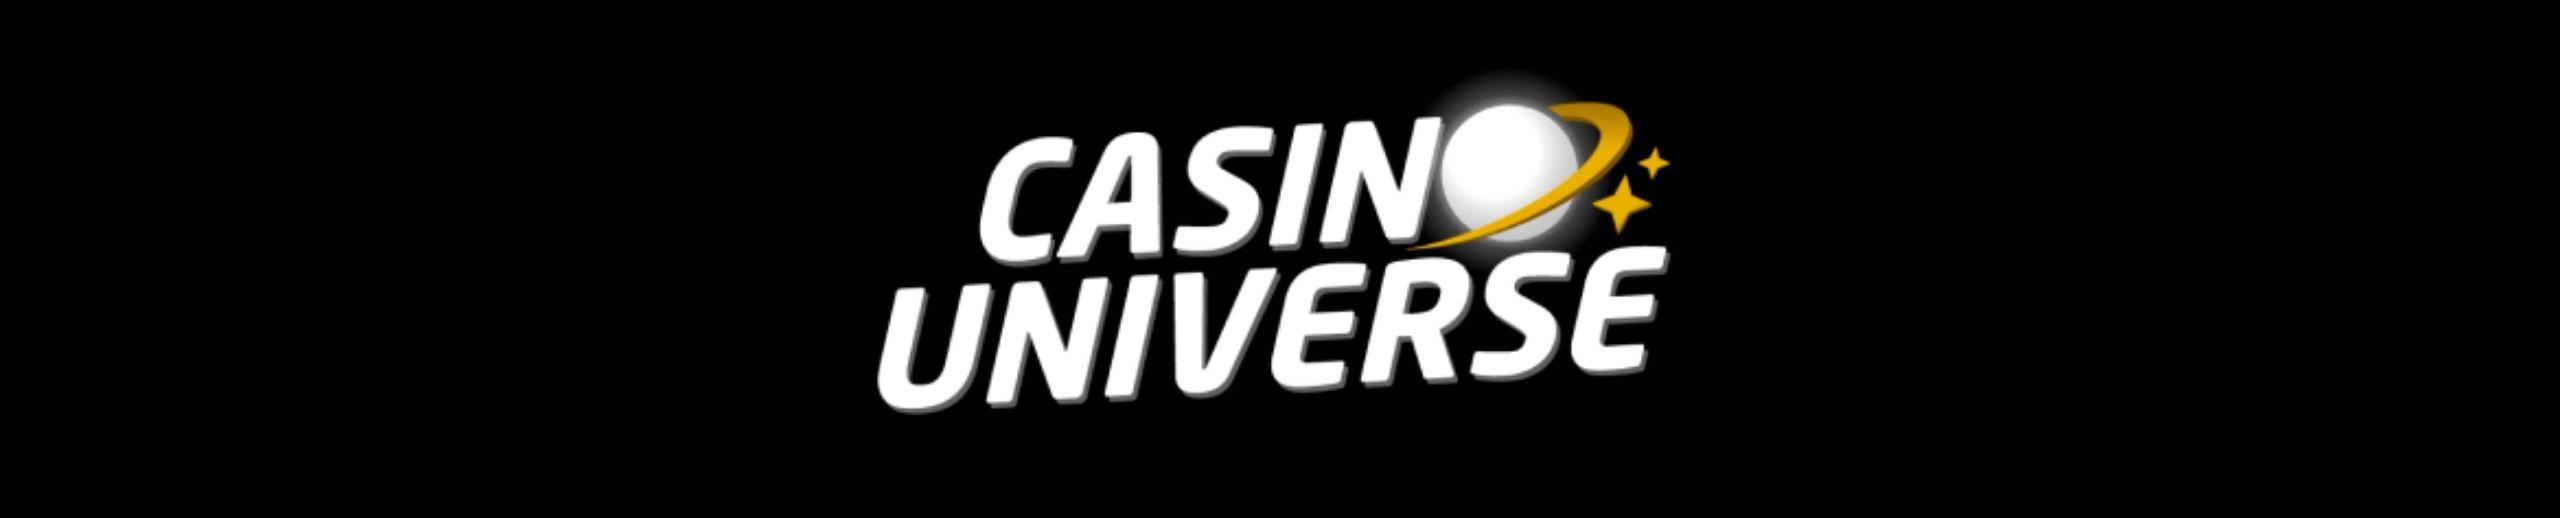 casinouniverse